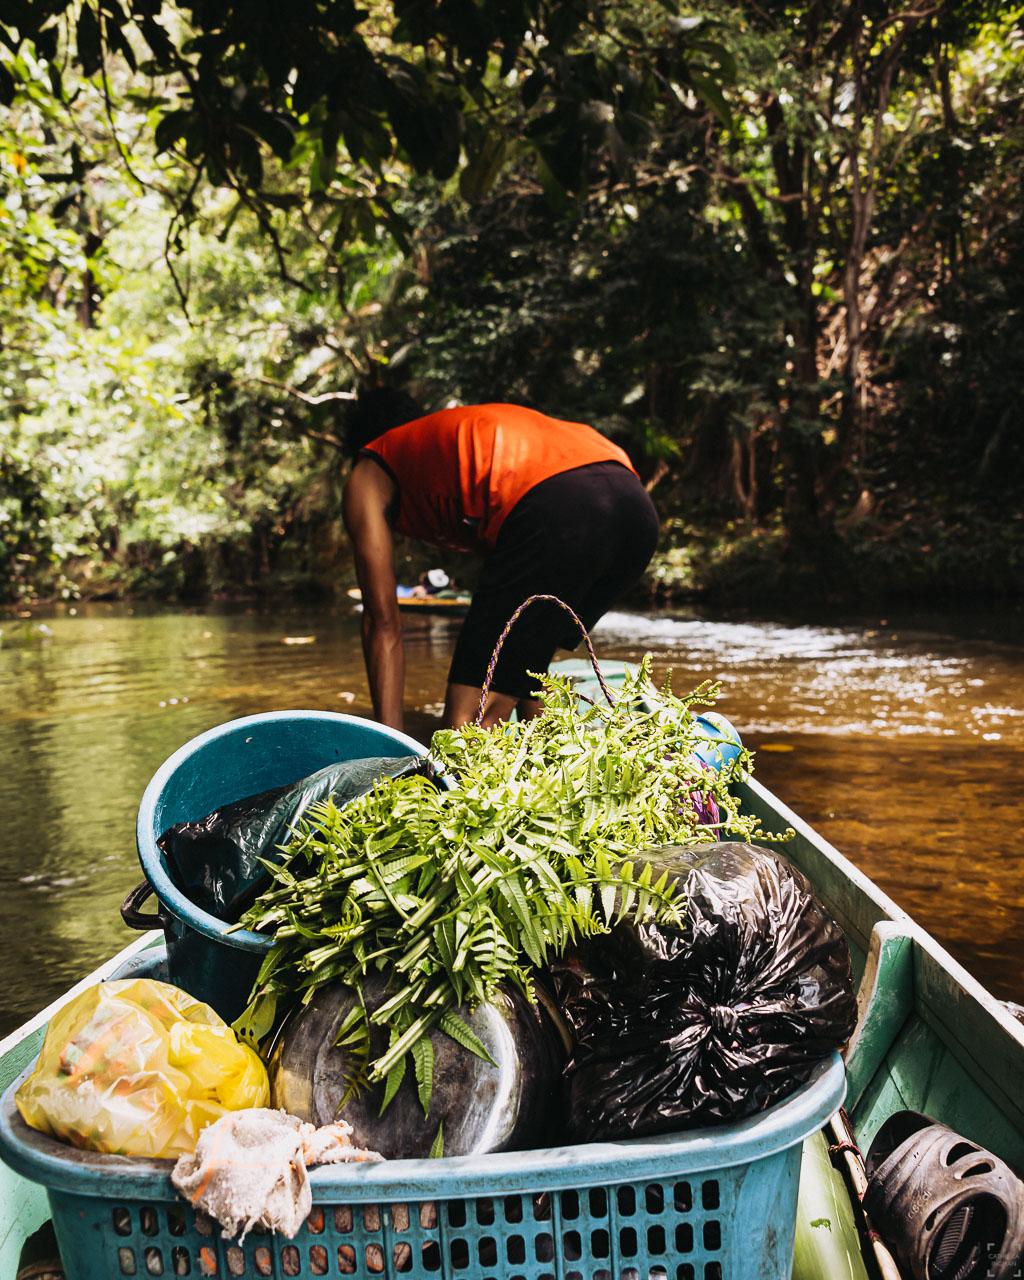 Nanga Sumpa, djungeläventyr på Borneo